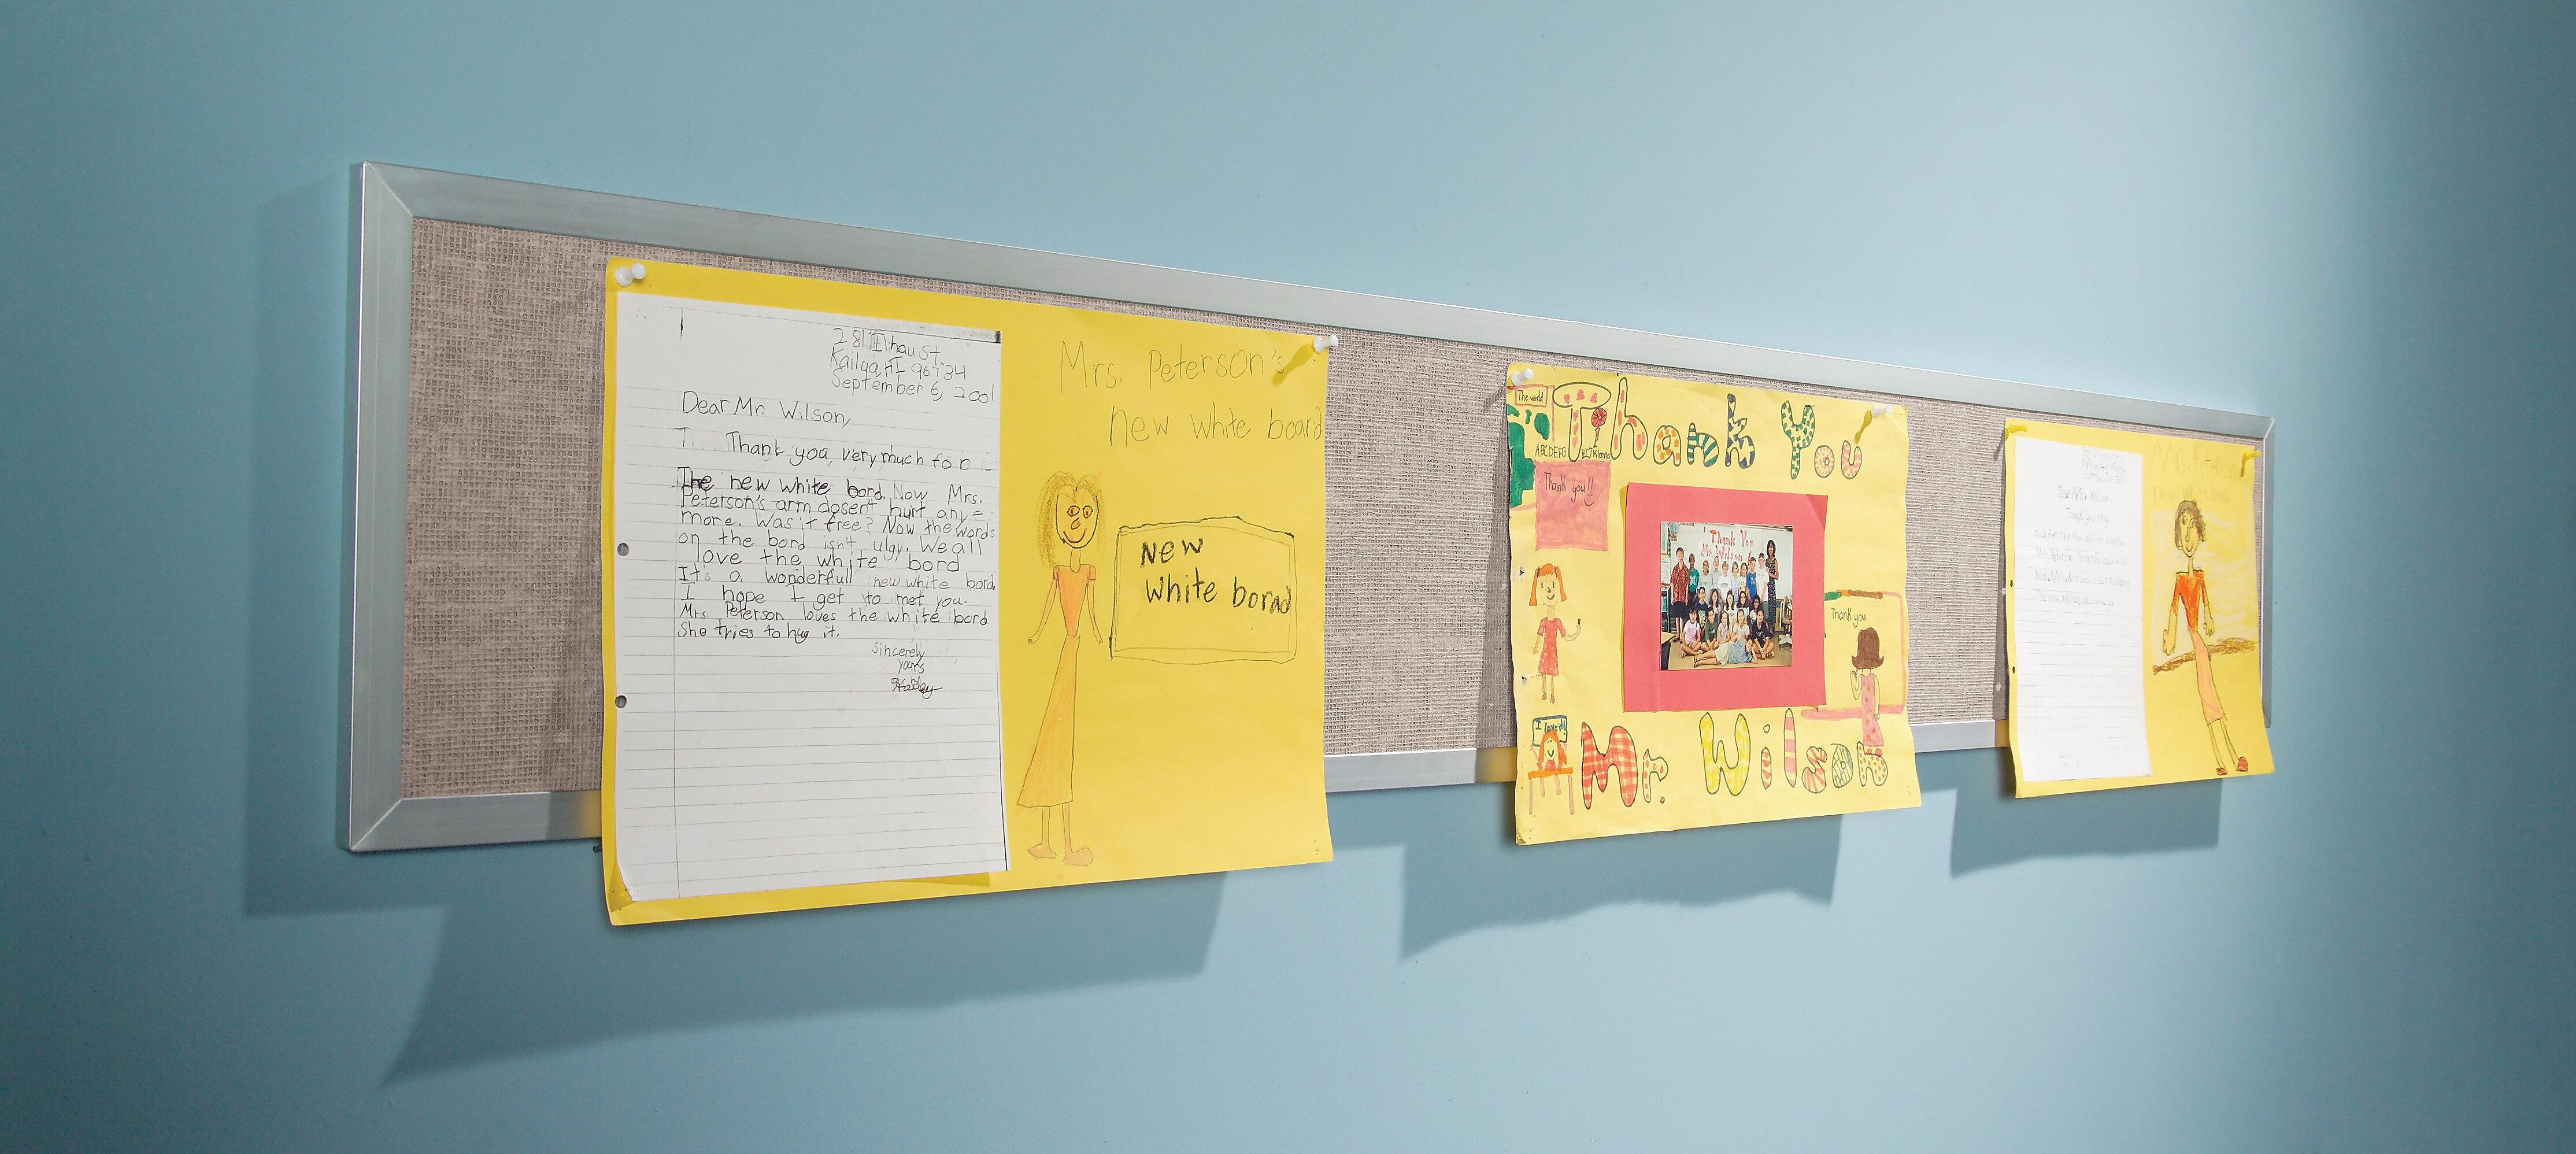 Best-Rite Wall Mounted Bulletin Board & Reviews | Wayfair